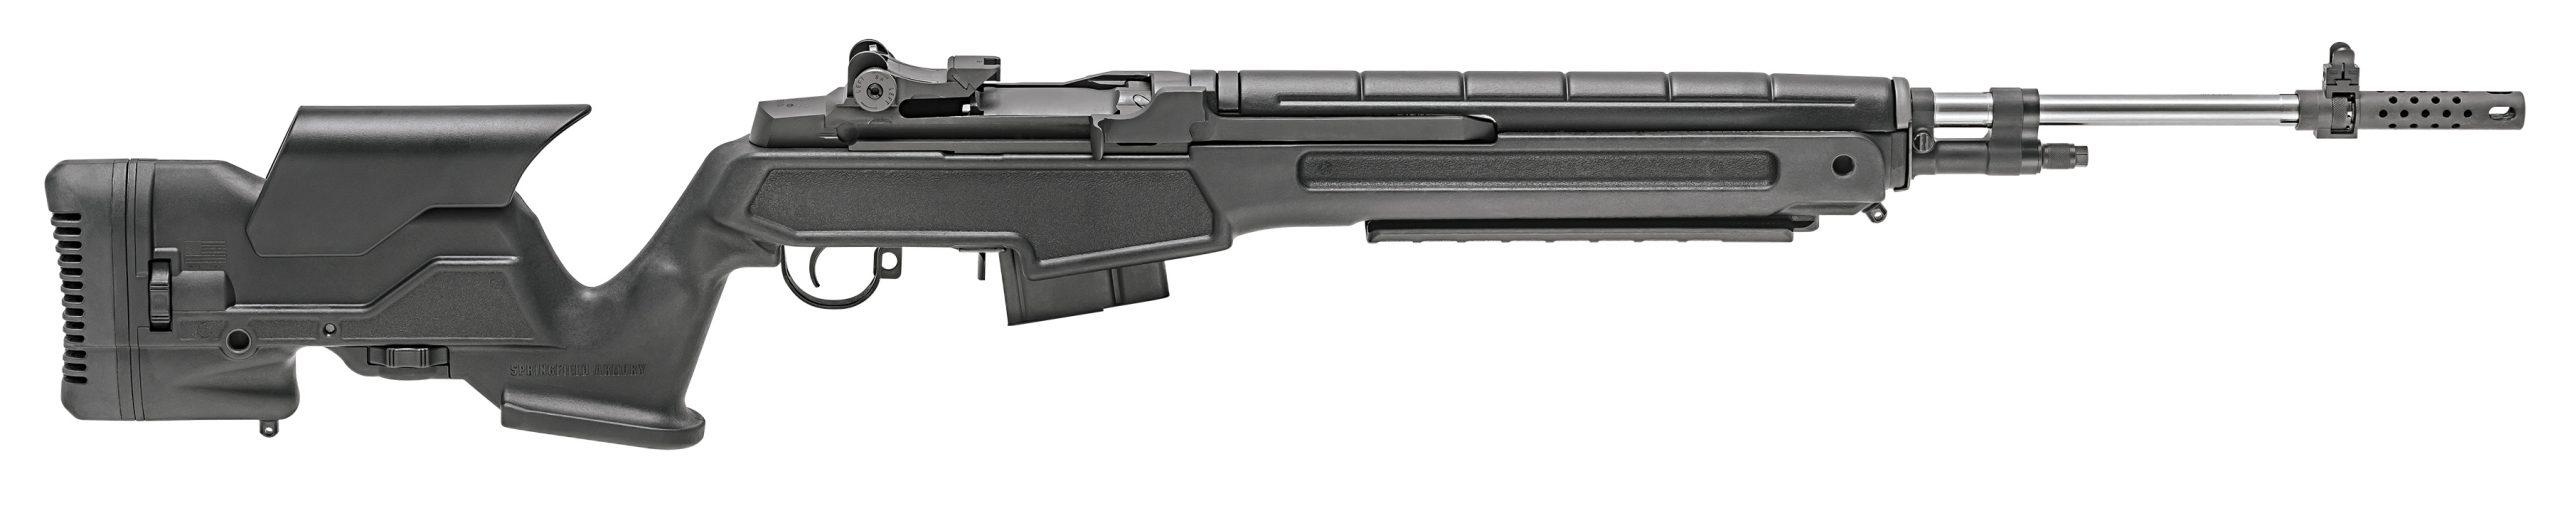 Springfield Armory M1A PRECISION 6.5 CREEDMOOR